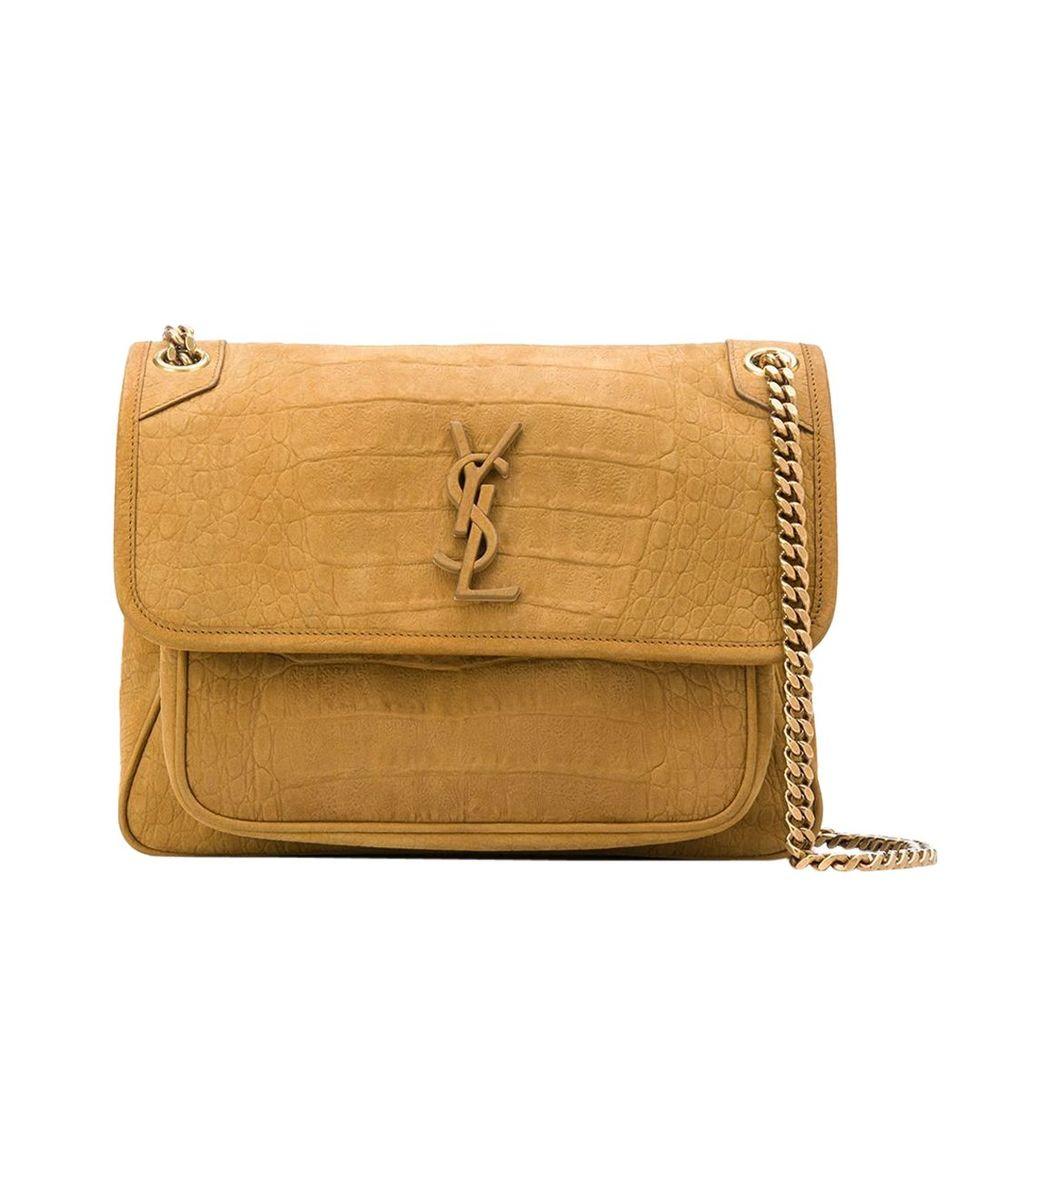 Saint Laurent Leathers Niki Medium Bag, Ochre Brown